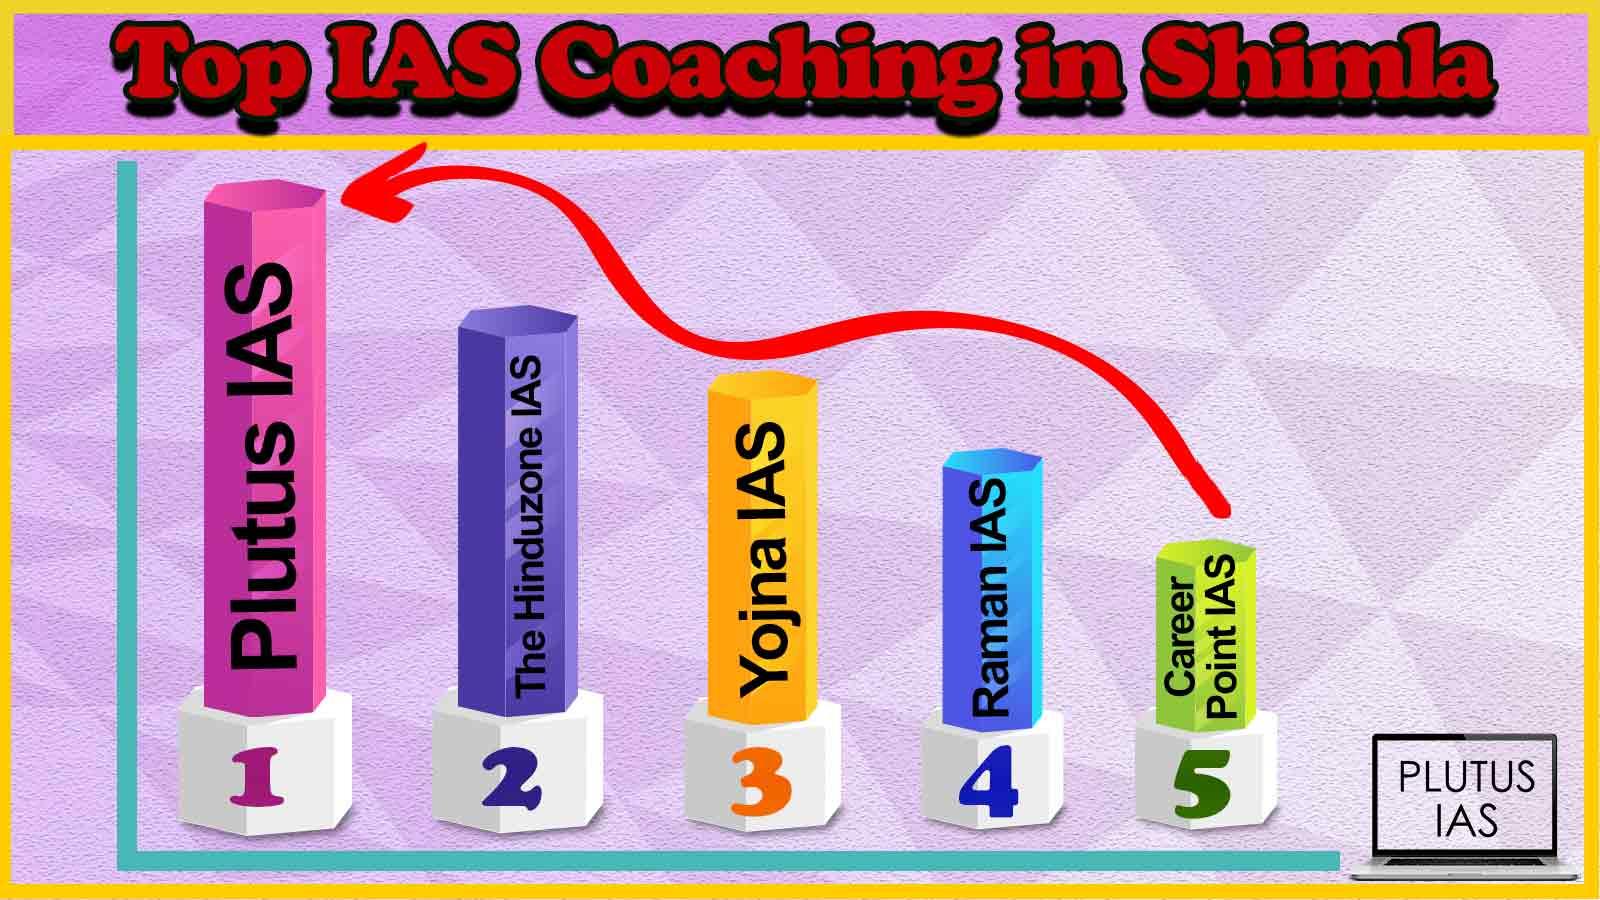 Best 10 IAS Coaching in Shimla